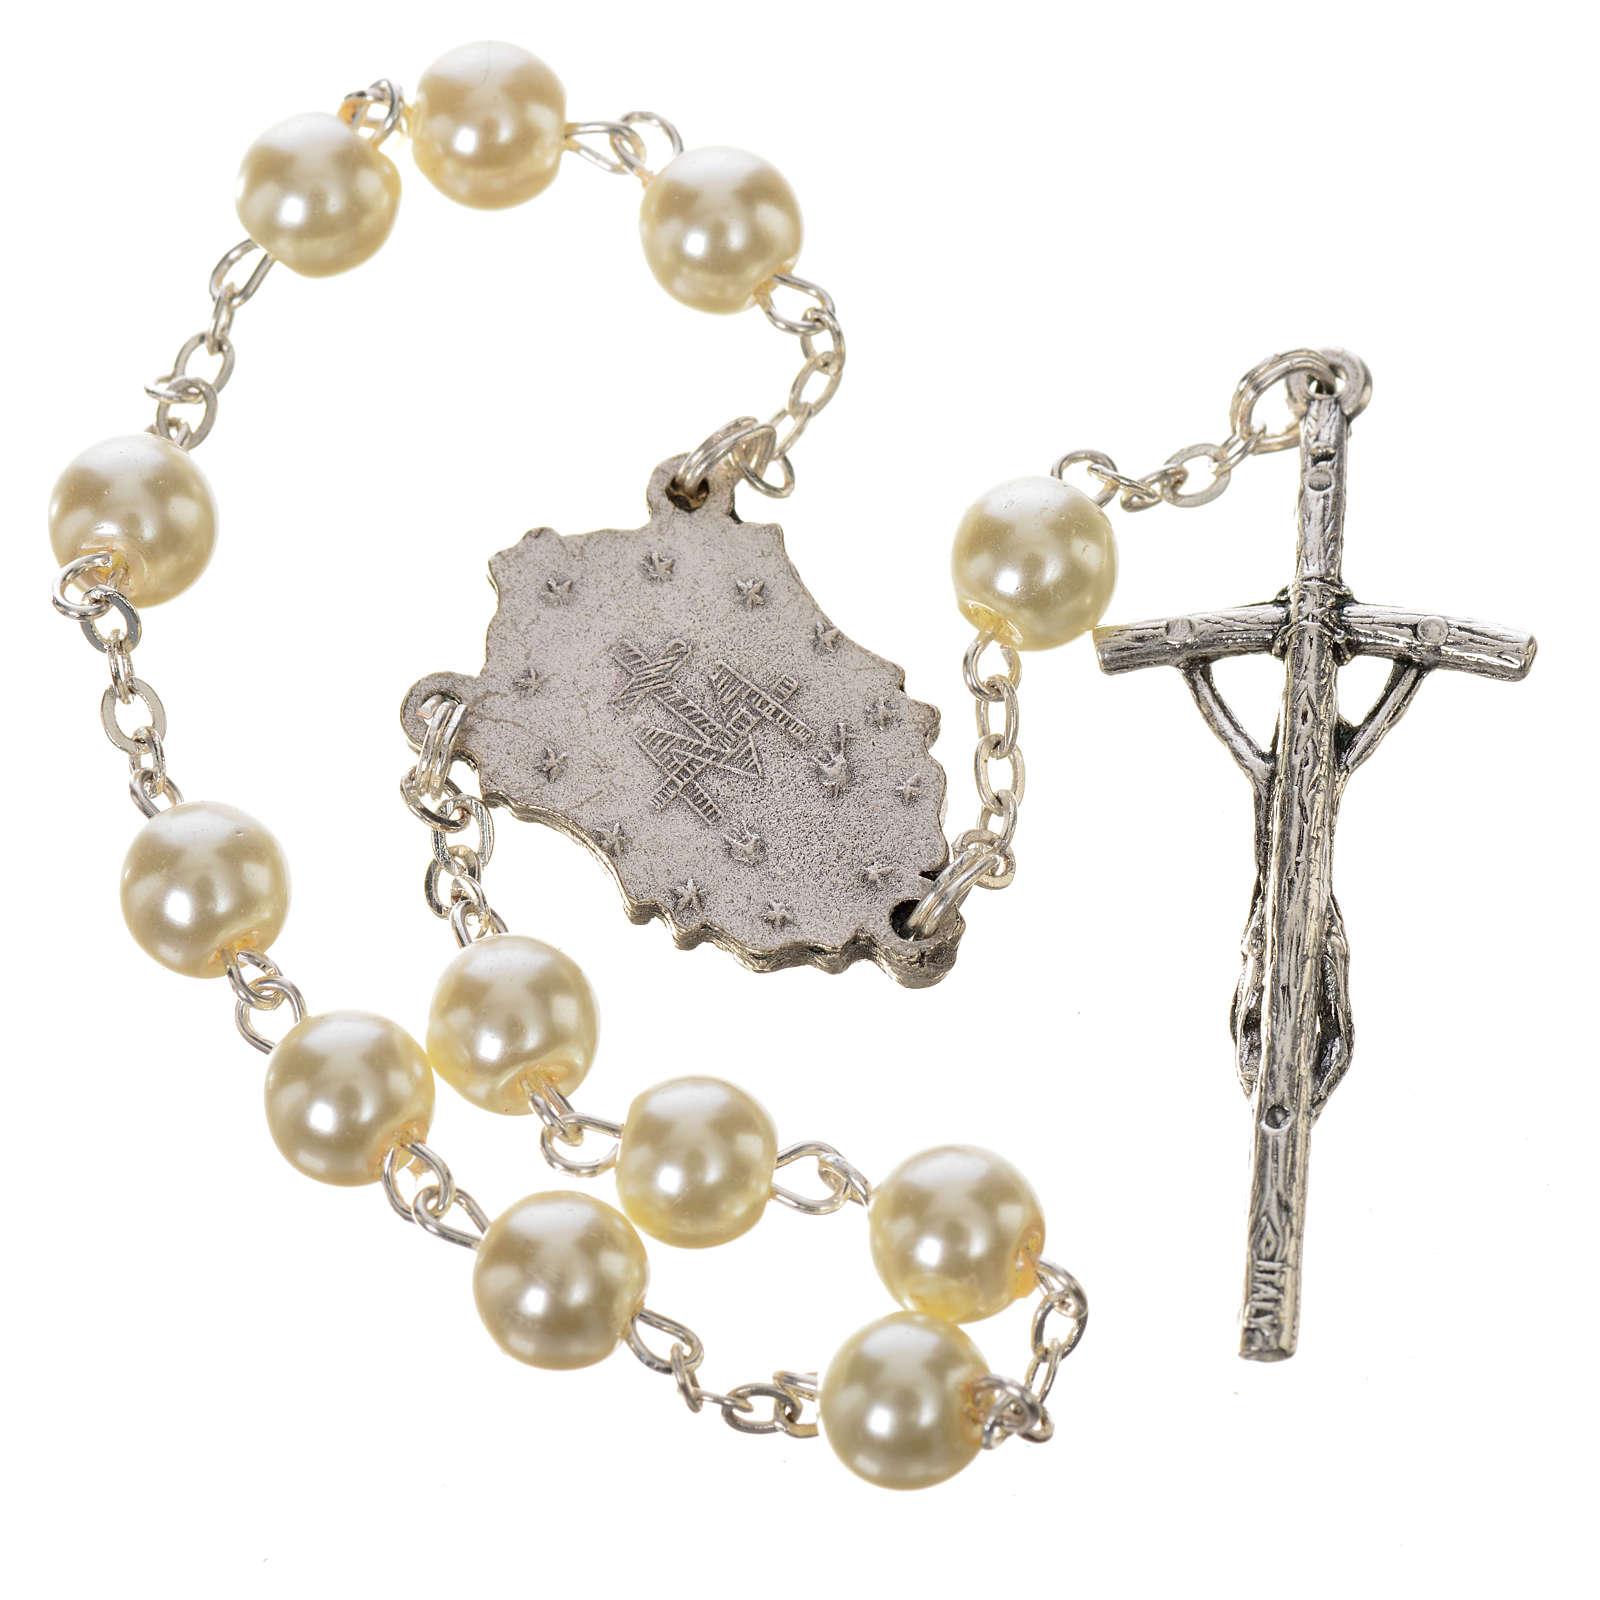 Trisagio Idente bianco croce pastorale crociera Miracolosa 4